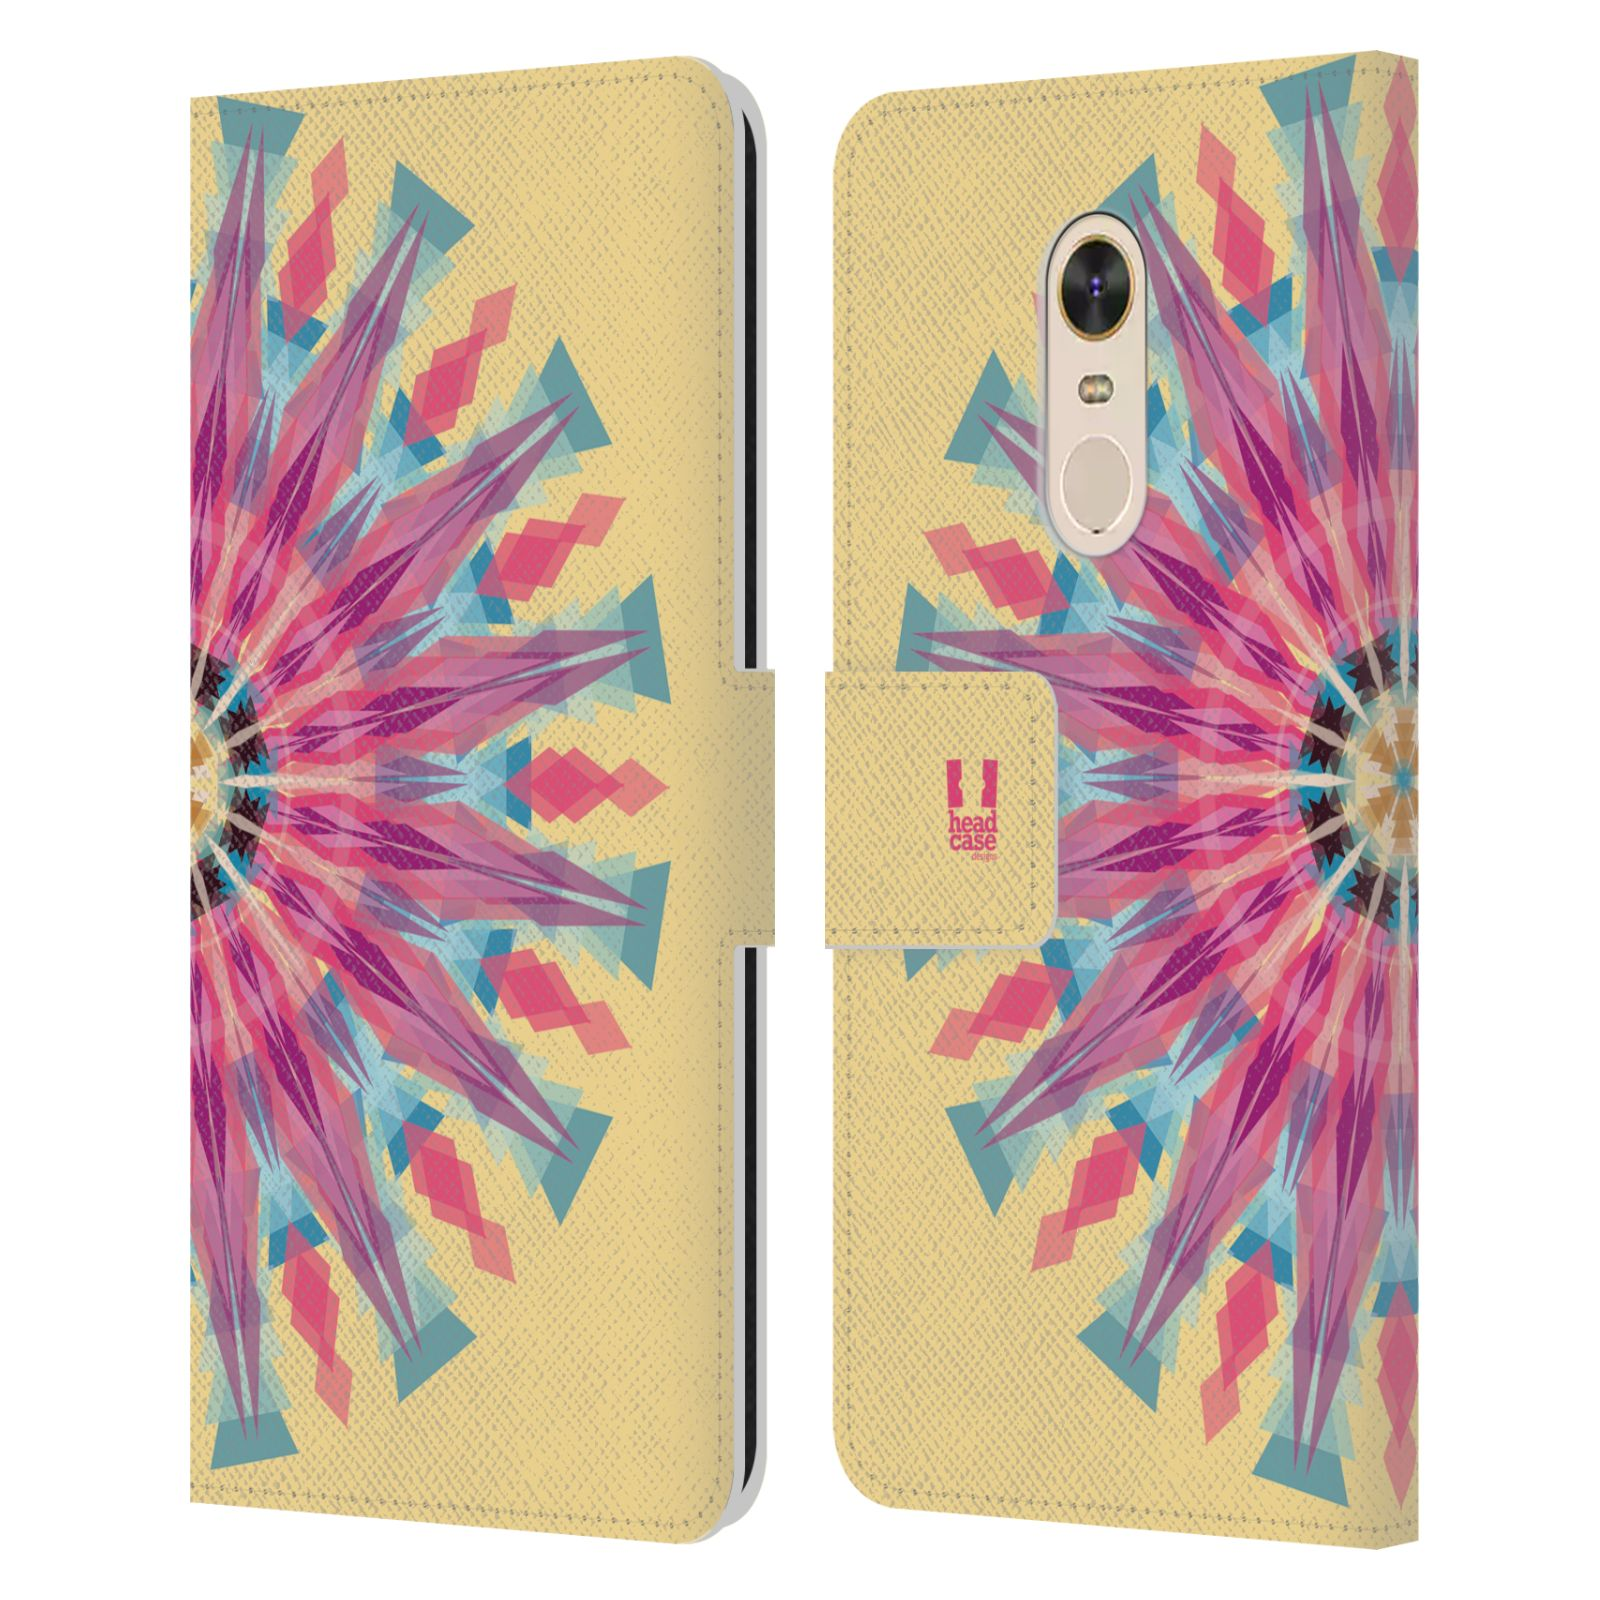 HEAD CASE Flipové pouzdro pro mobil Xiaomi Redmi Note 5 kaleidoskop mandala růžová barva slunce